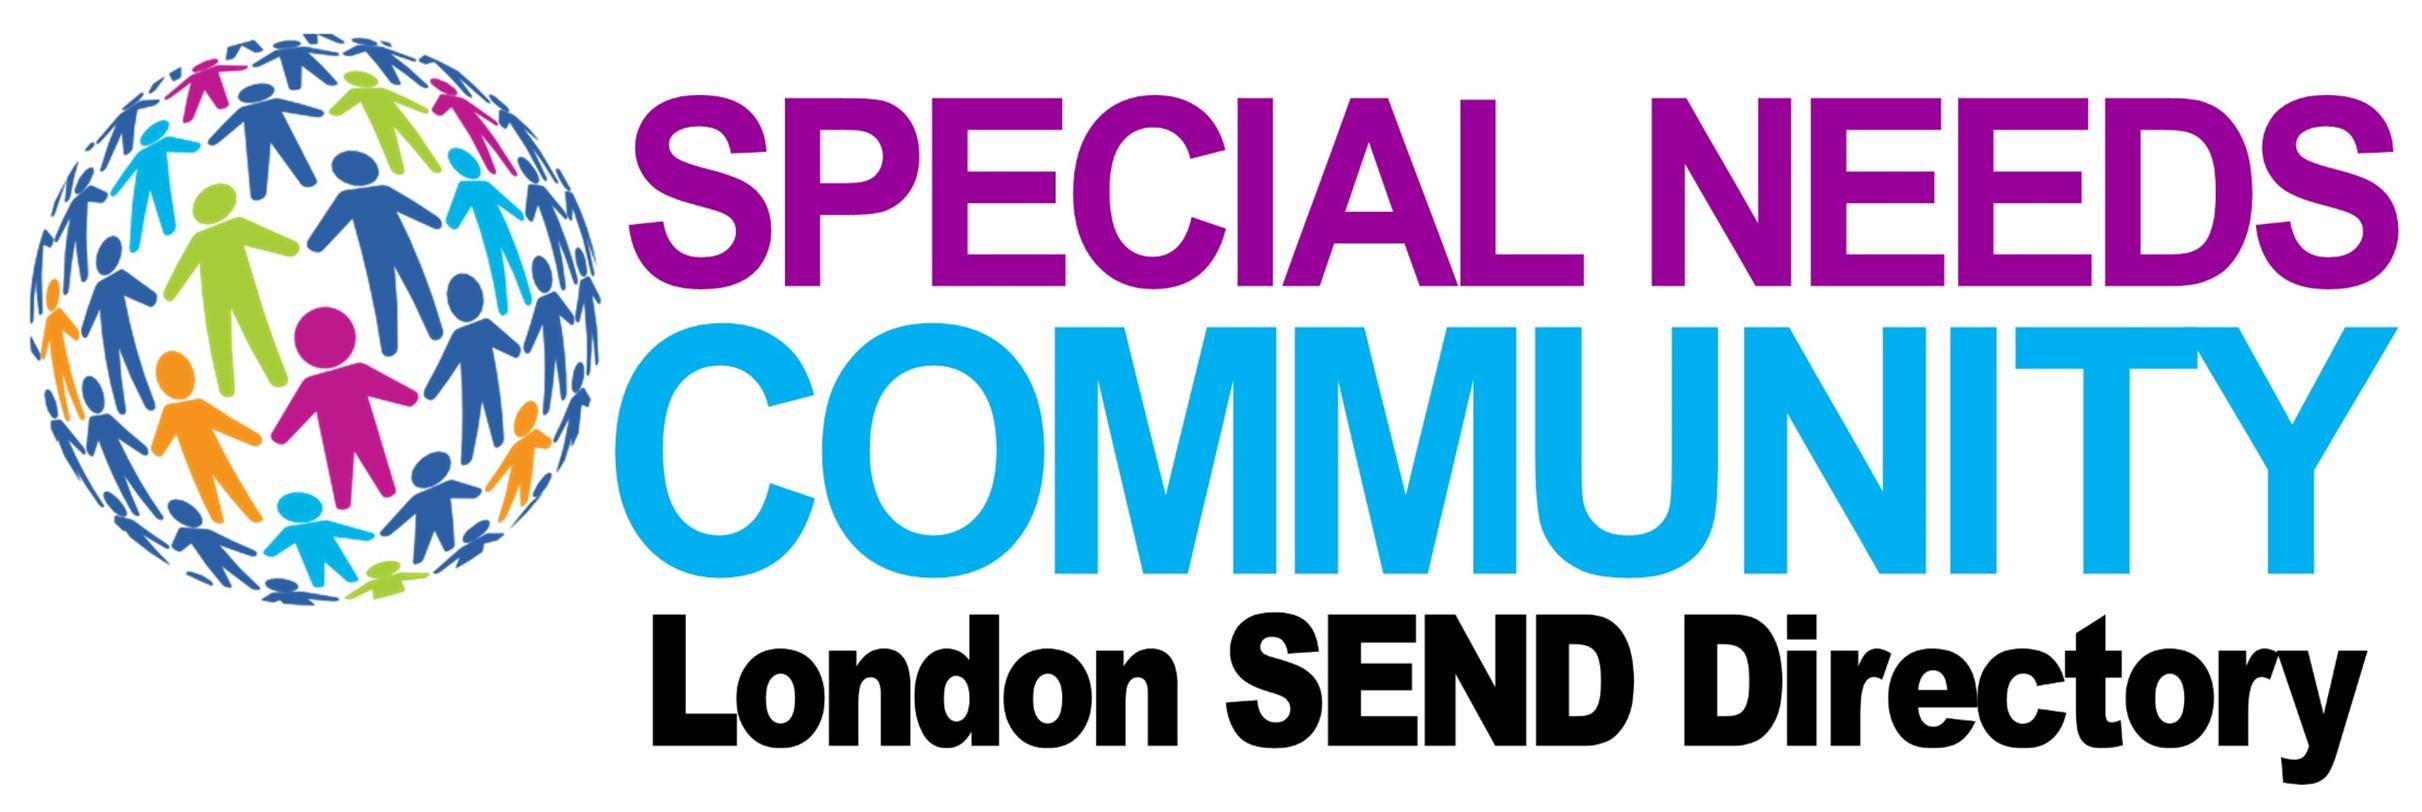 London SEND Directory